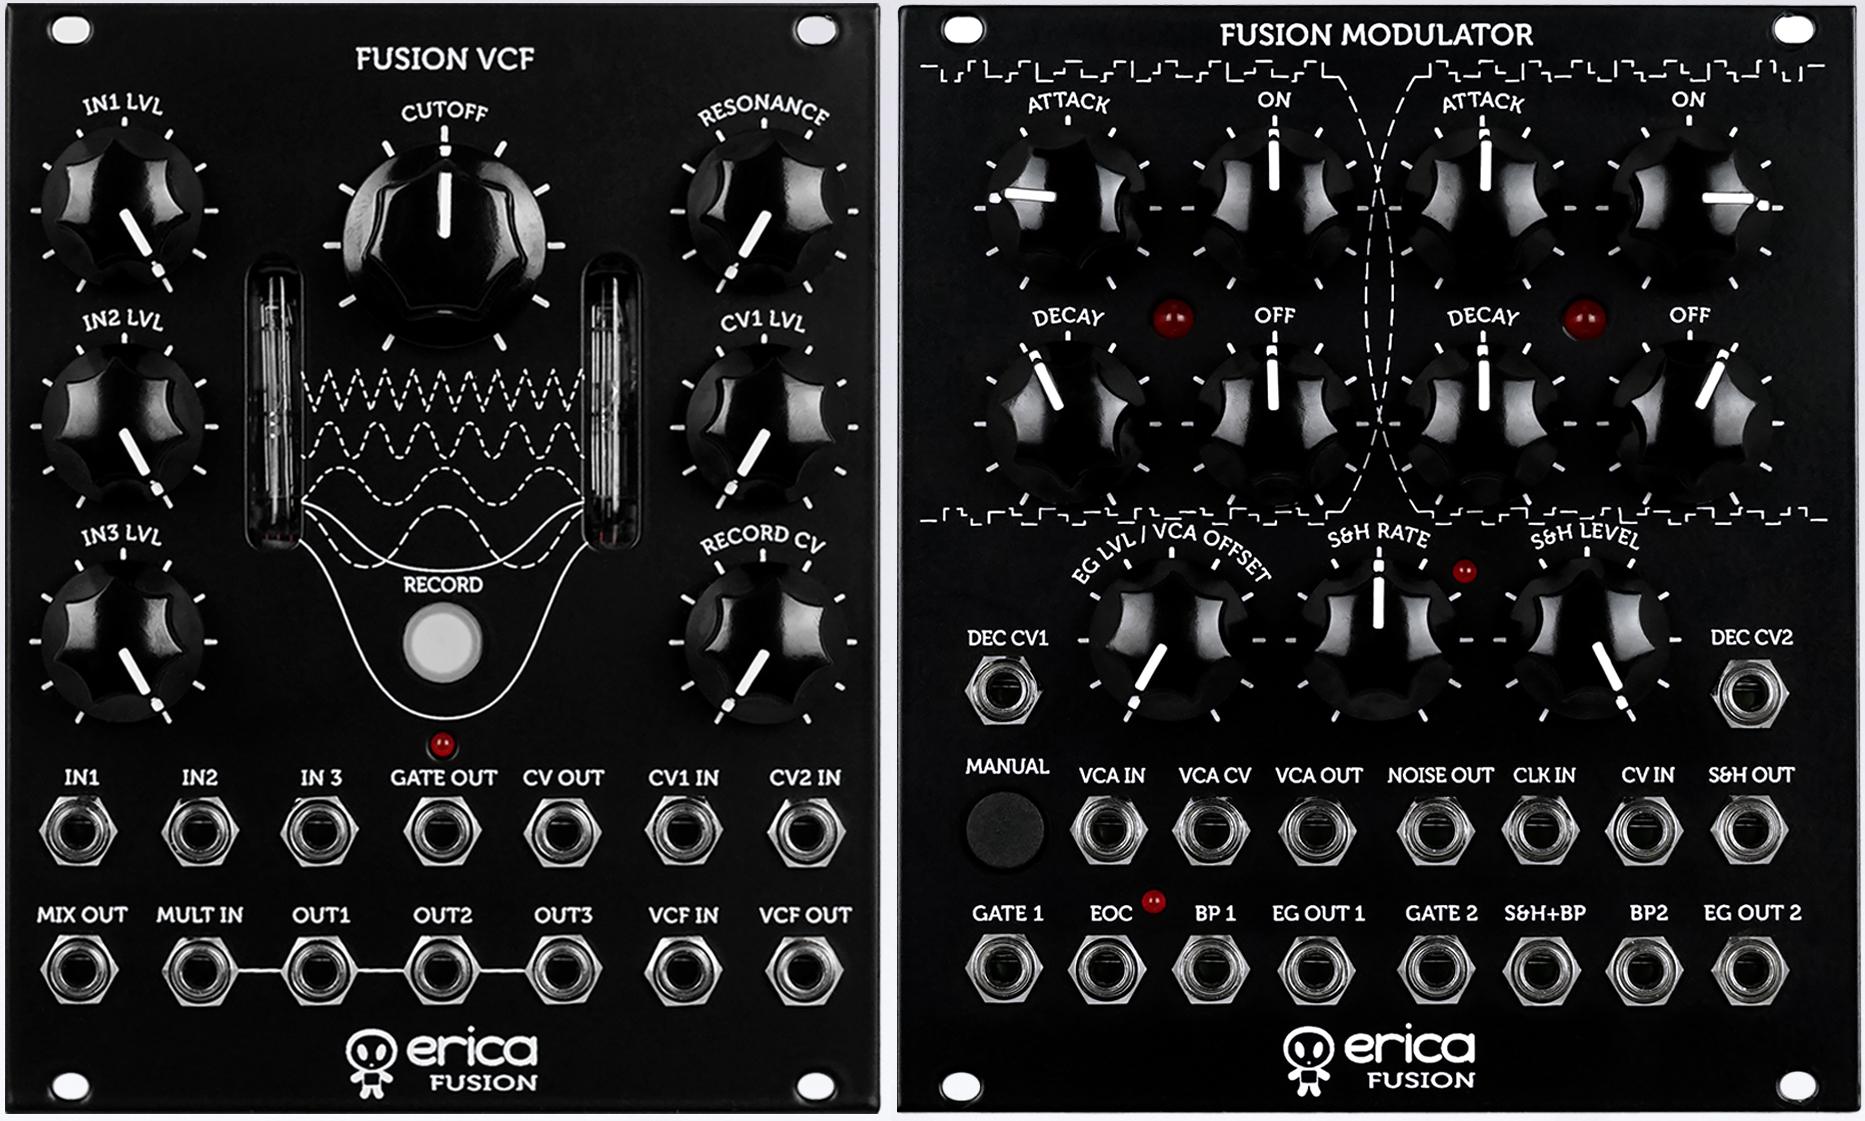 Fusion-VCF-modulator